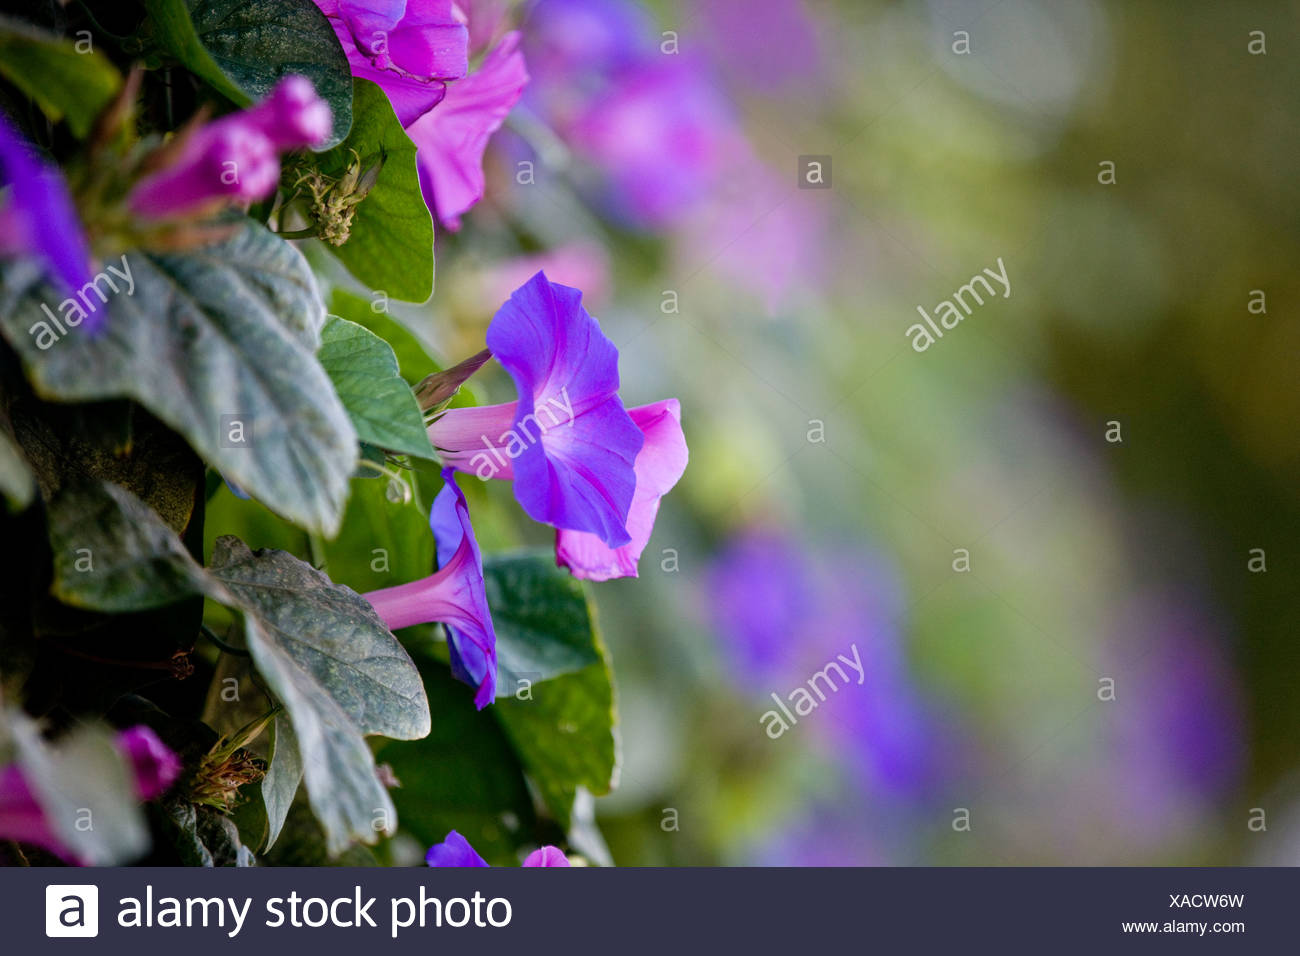 Purple bindweed or morning glory flowers - Stock Image